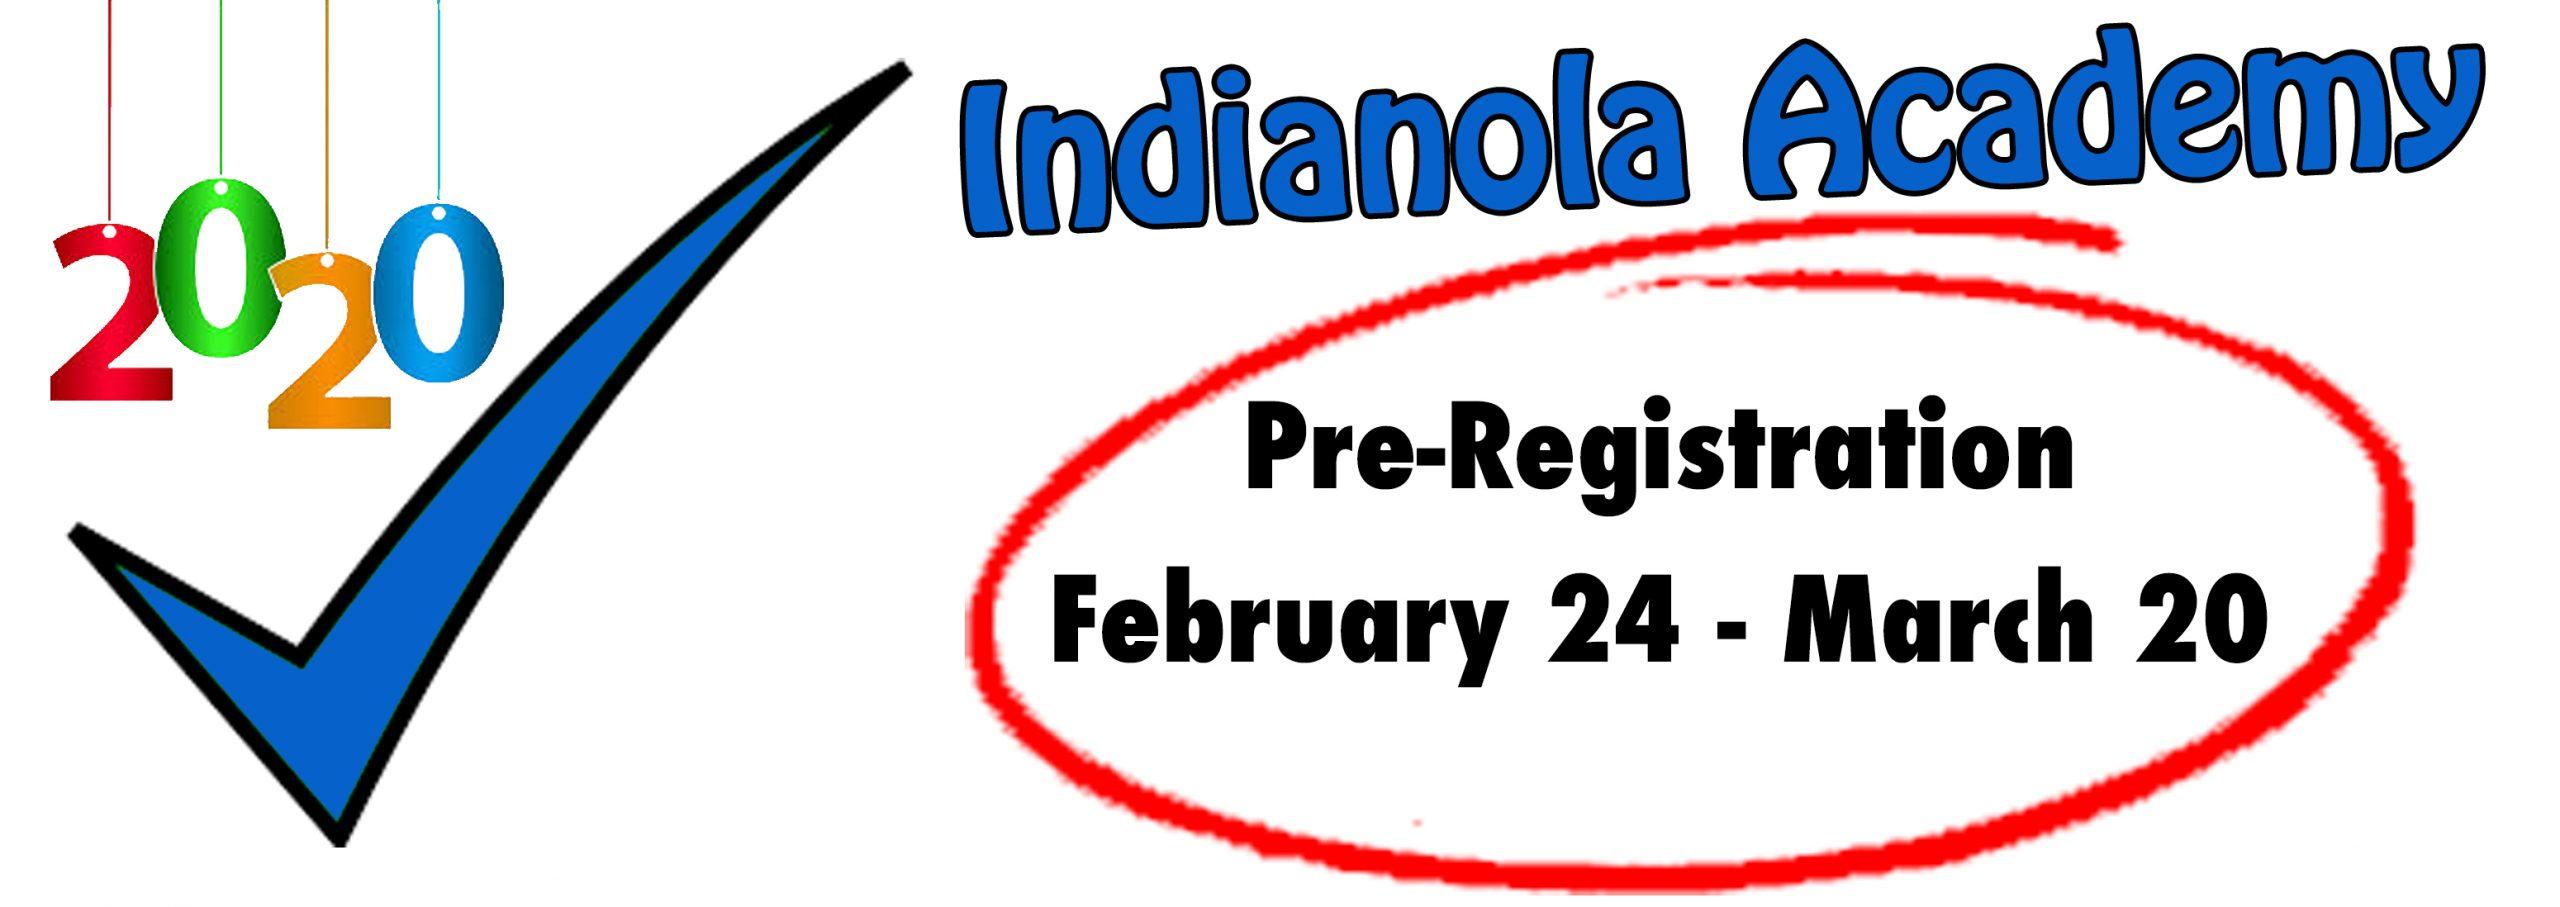 Pre registration